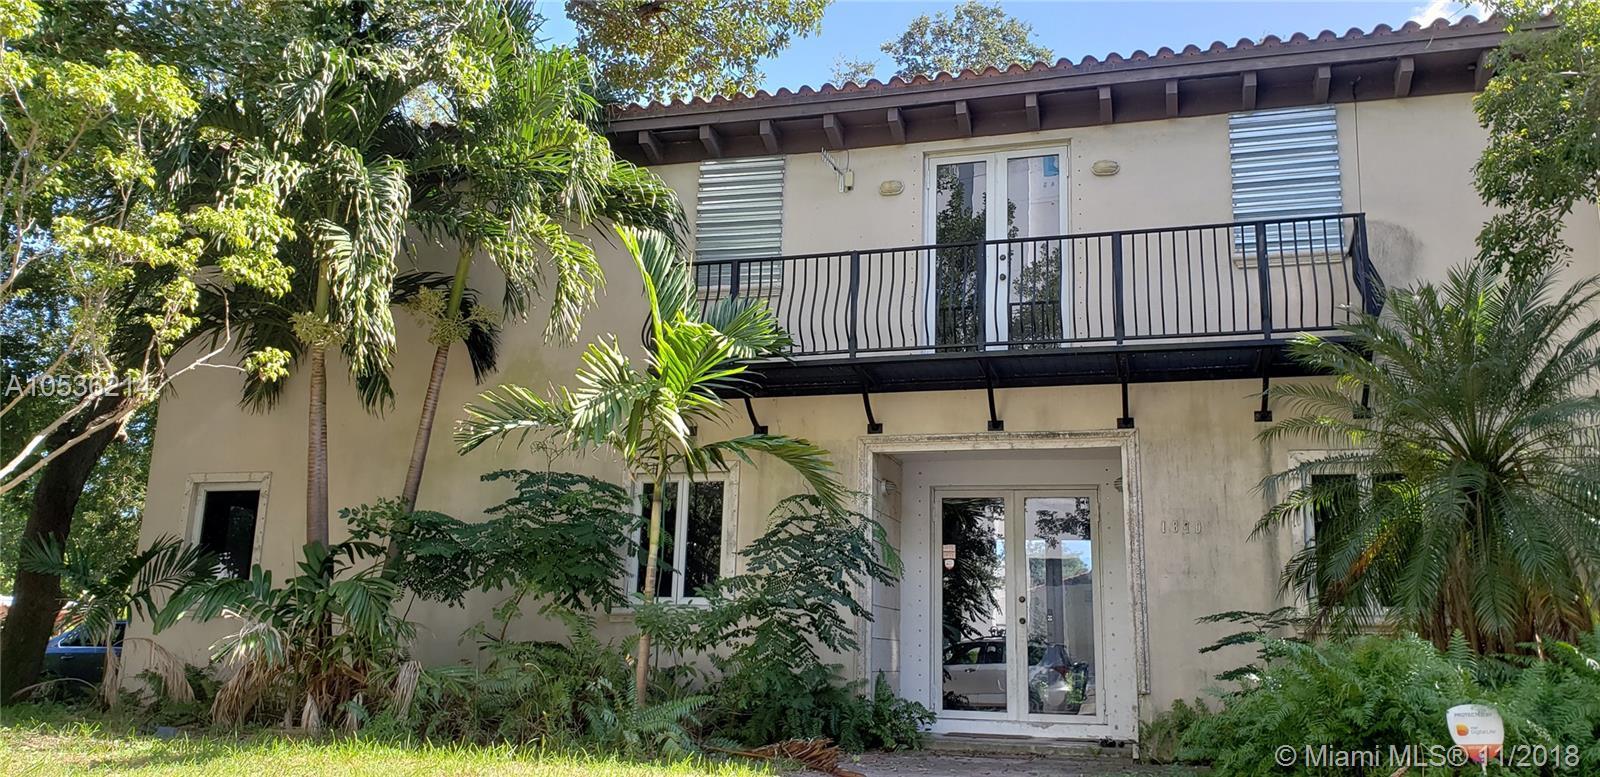 1870 Nw South River Dr, Miami FL, 33125